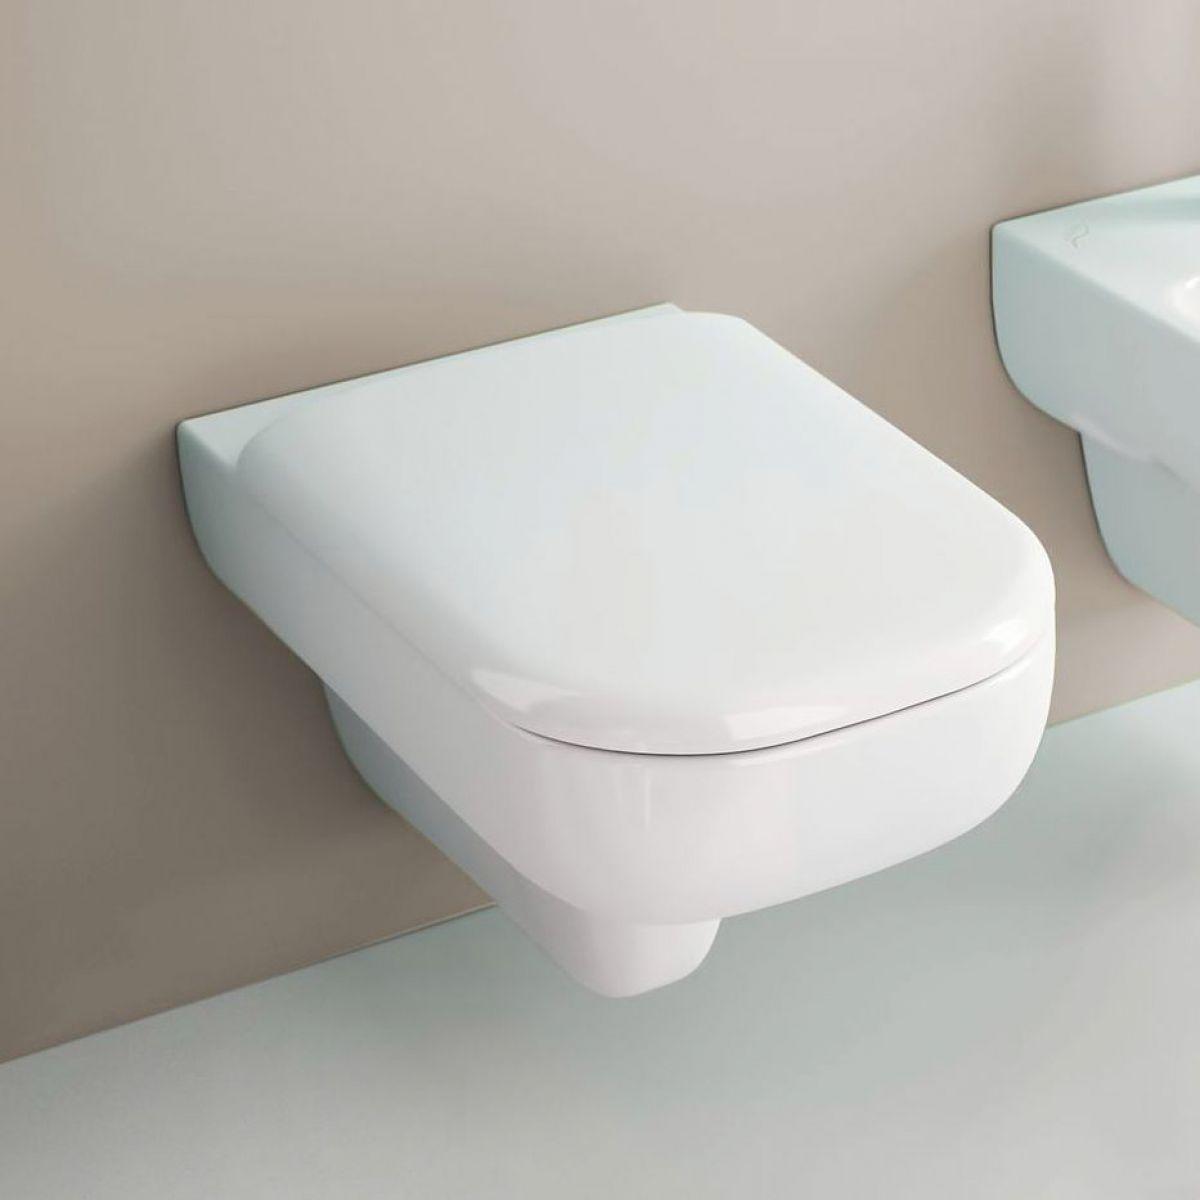 Geberit Smyle Wall Hung Toilet Uk Bathrooms